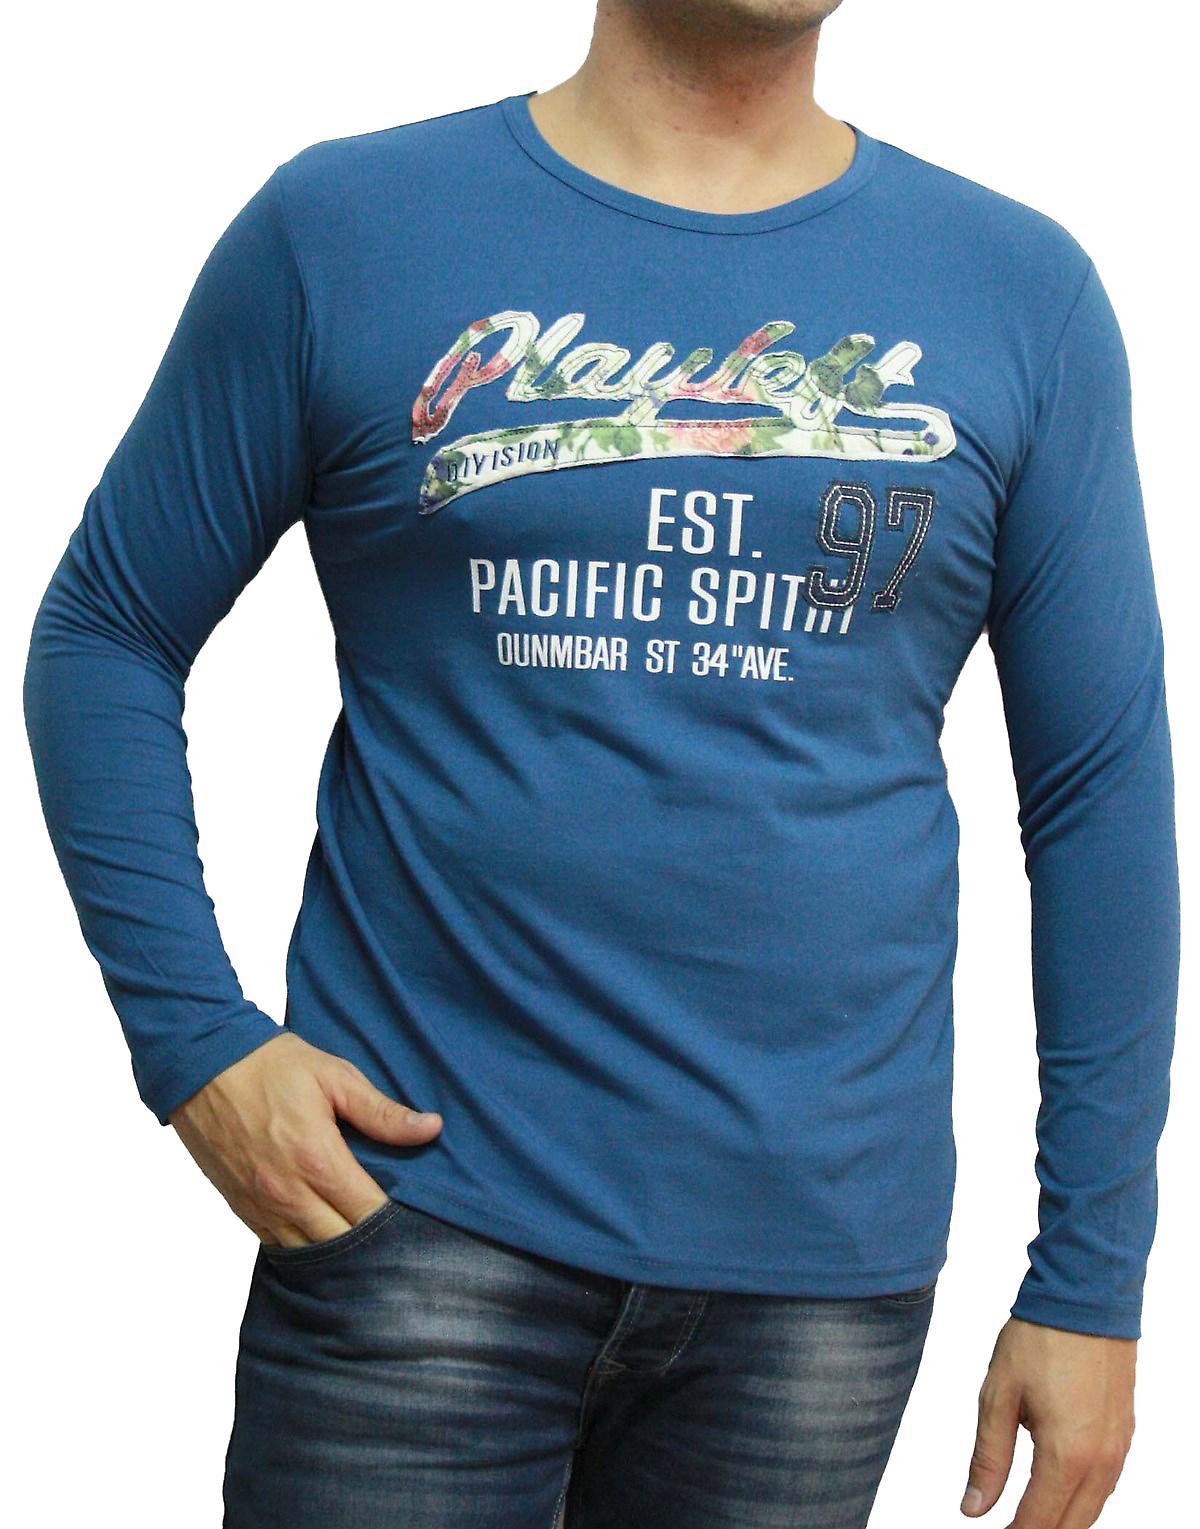 Waooh - T-Shirt Long Sleeve At Eddy Designs